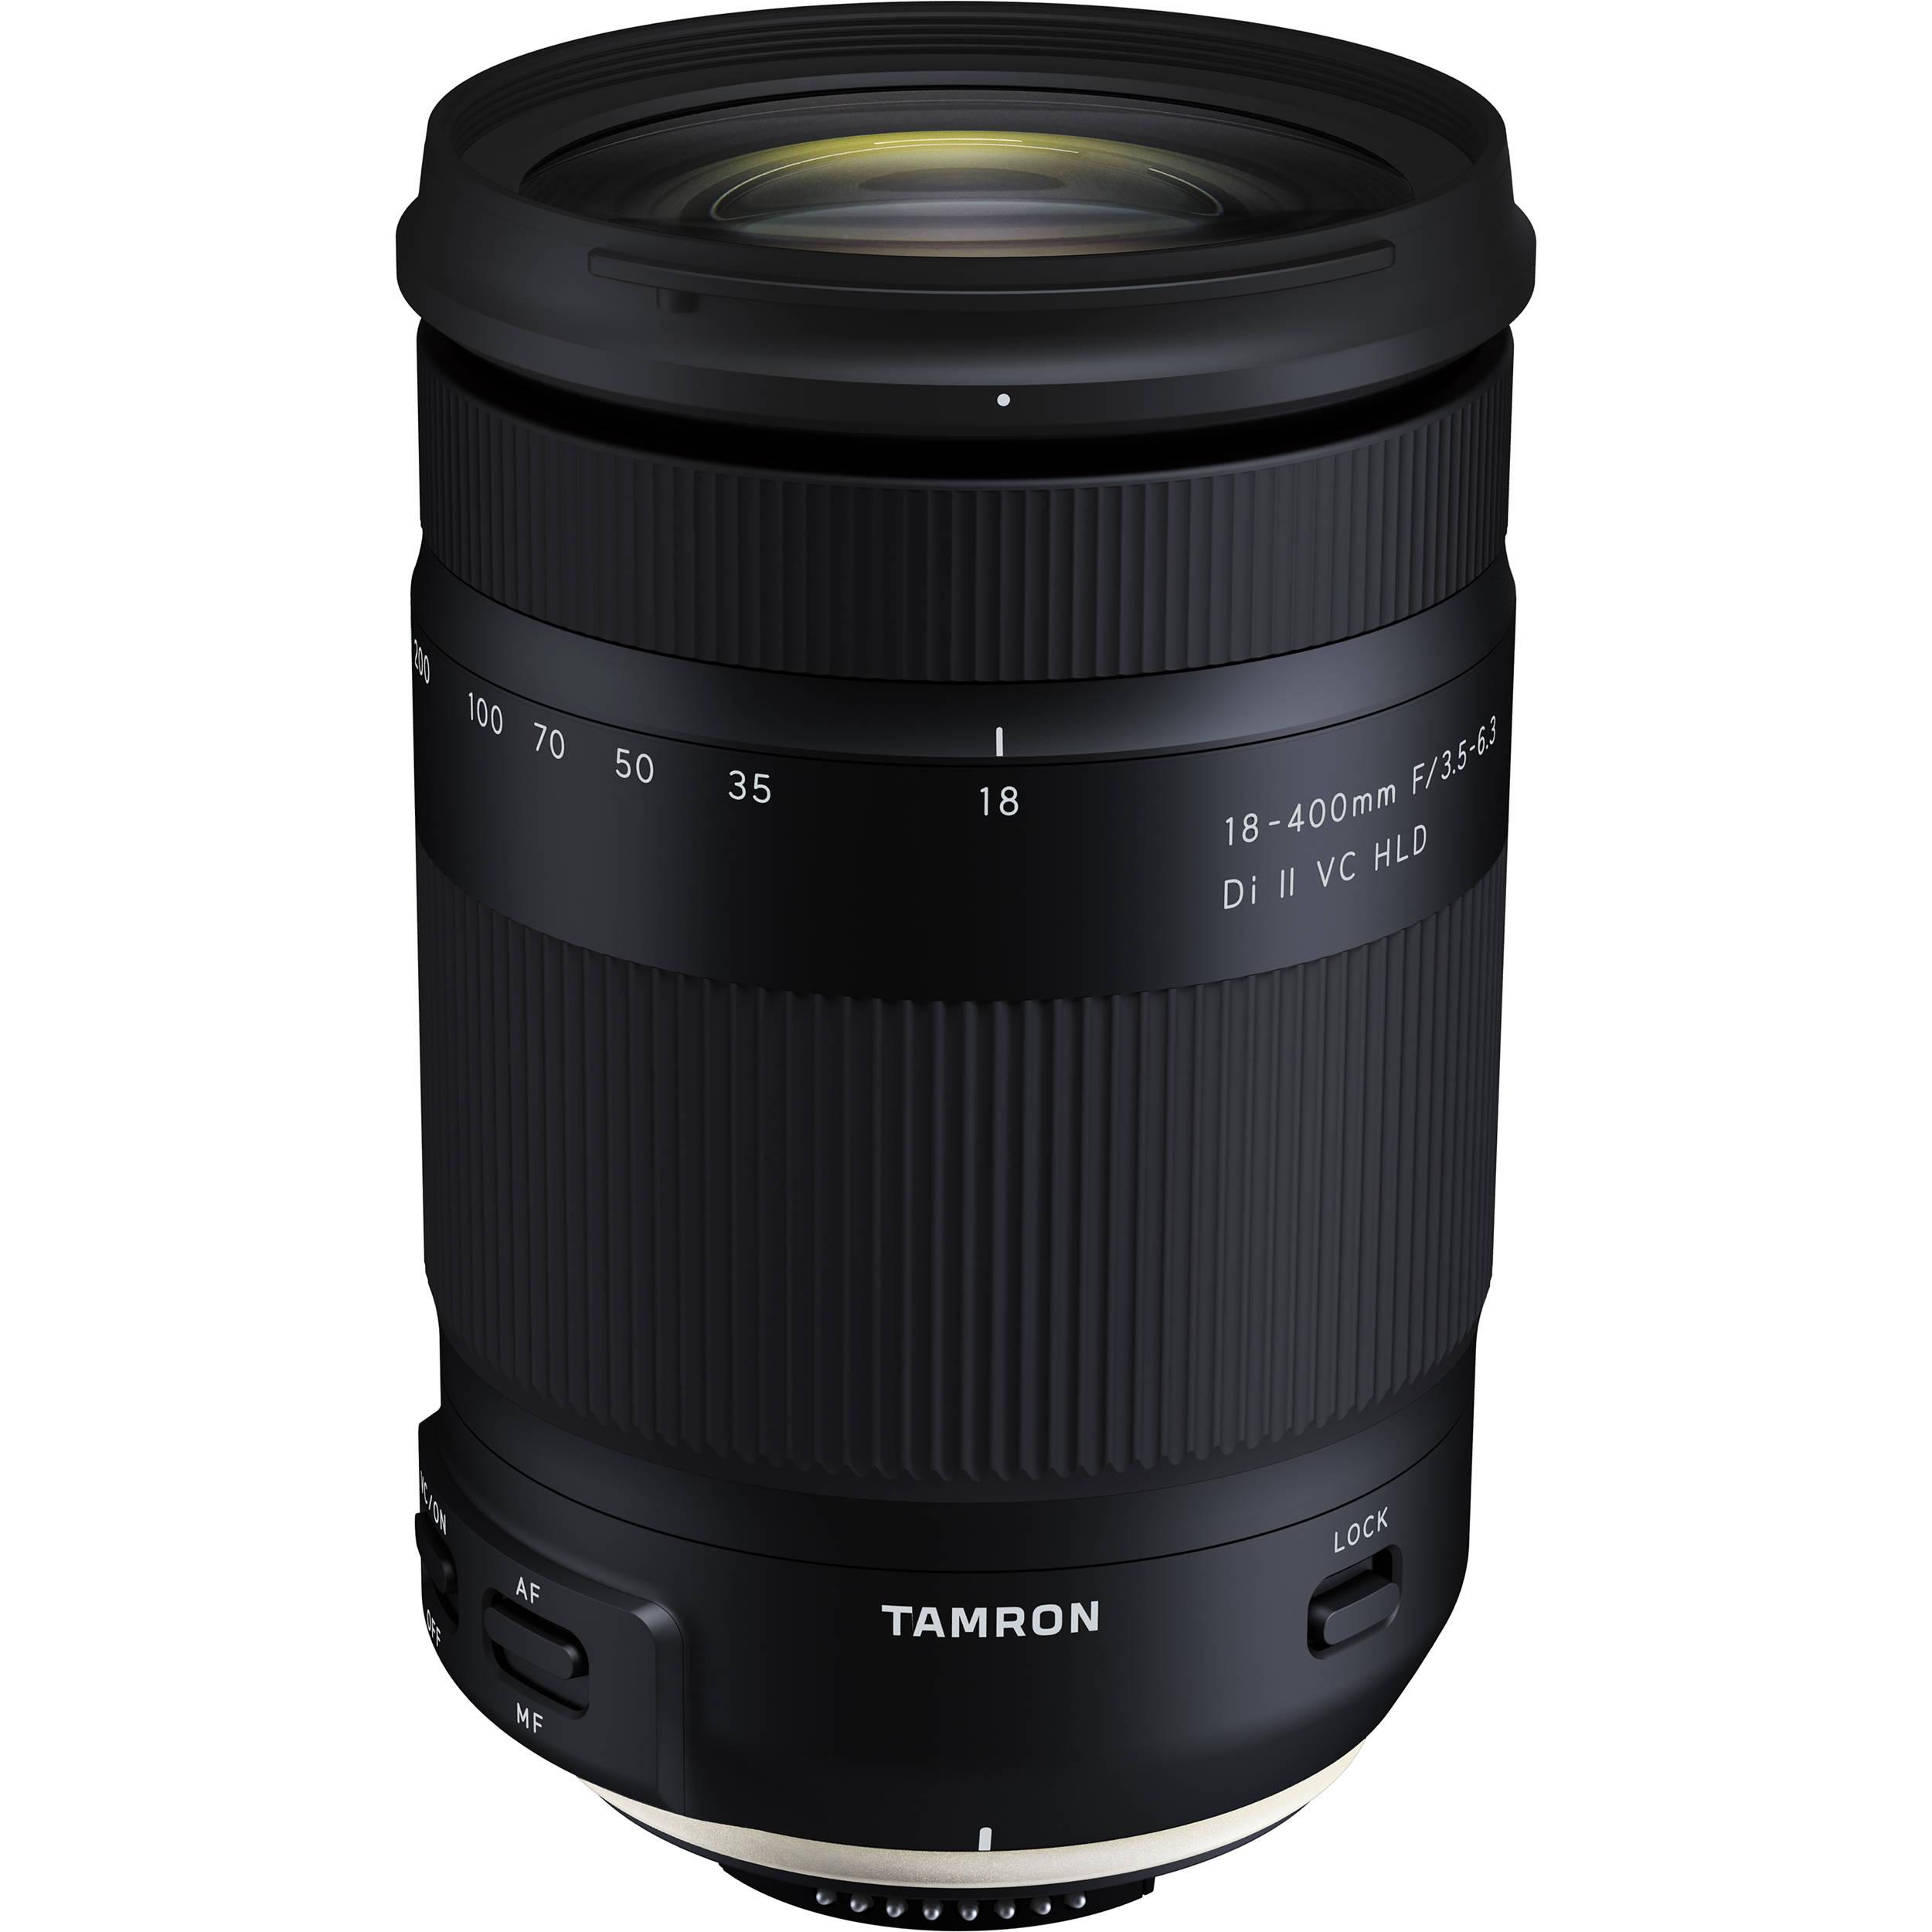 9bb726c009 Tamron 18-400mm f/3.5-6.3 Di II VC HLD Lens AFB028C-700 B&H